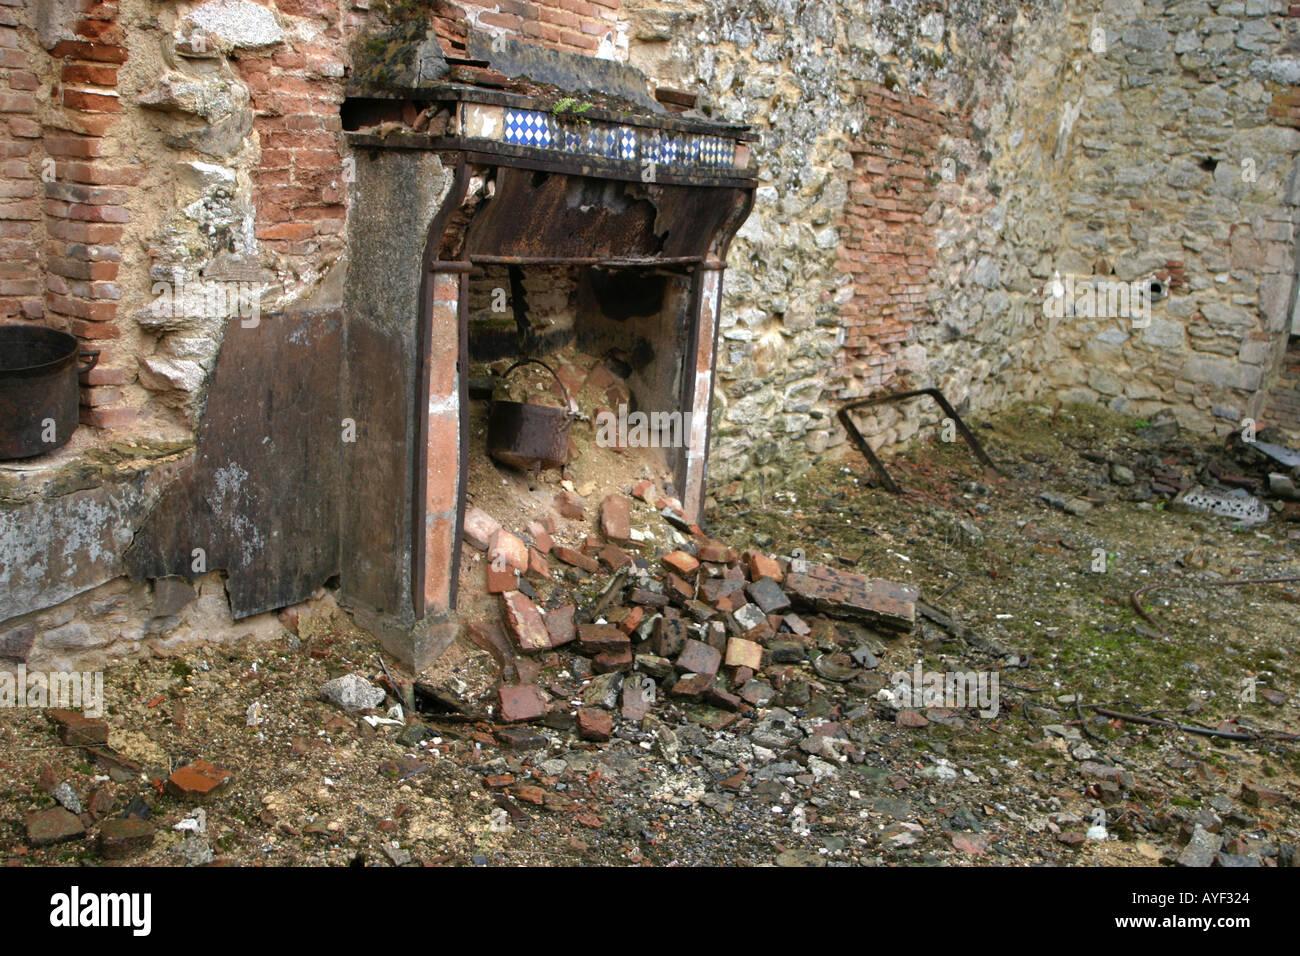 Old fireplace at Oradour sur Glane preserved Limousin village scene of WW2 Nazi SS massacre and destruction France - Stock Image